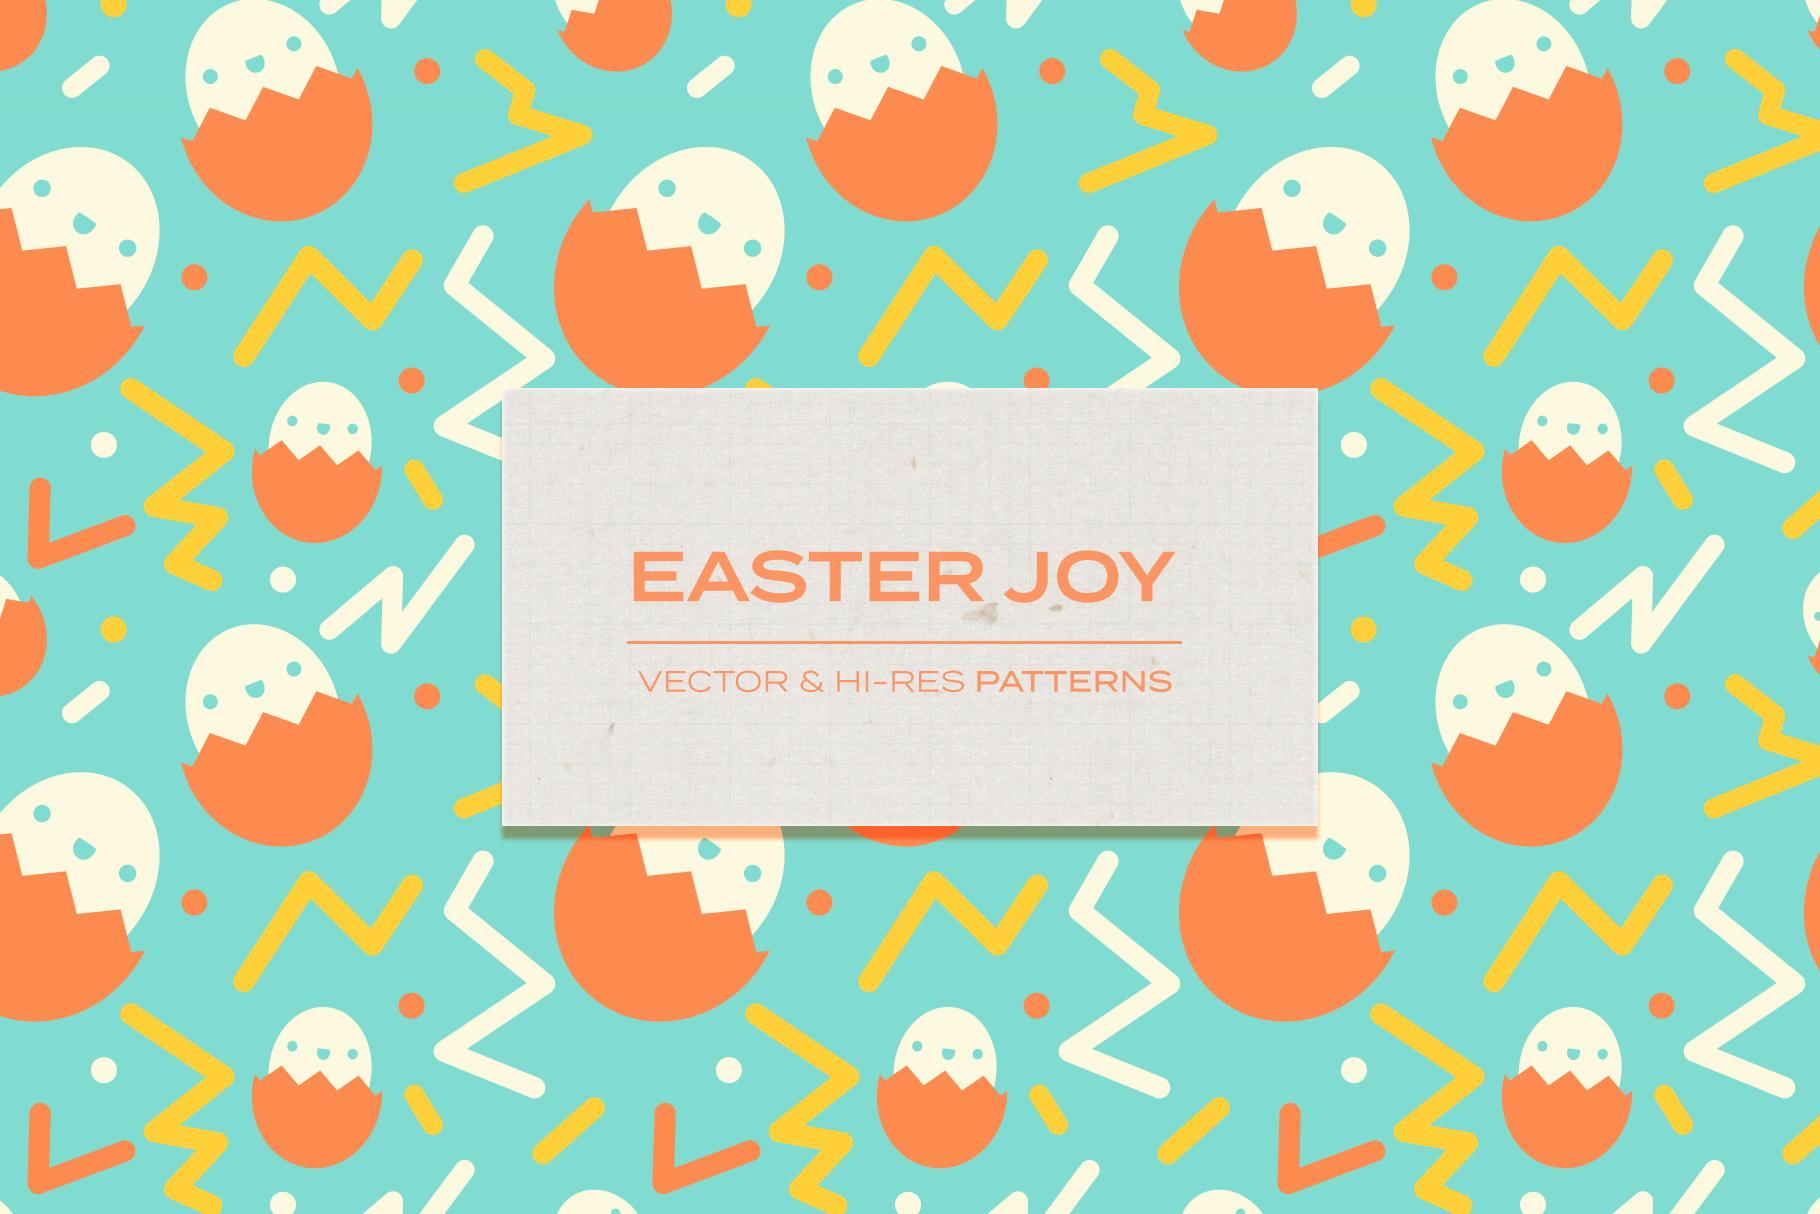 Easter Joy Patterns example image 1